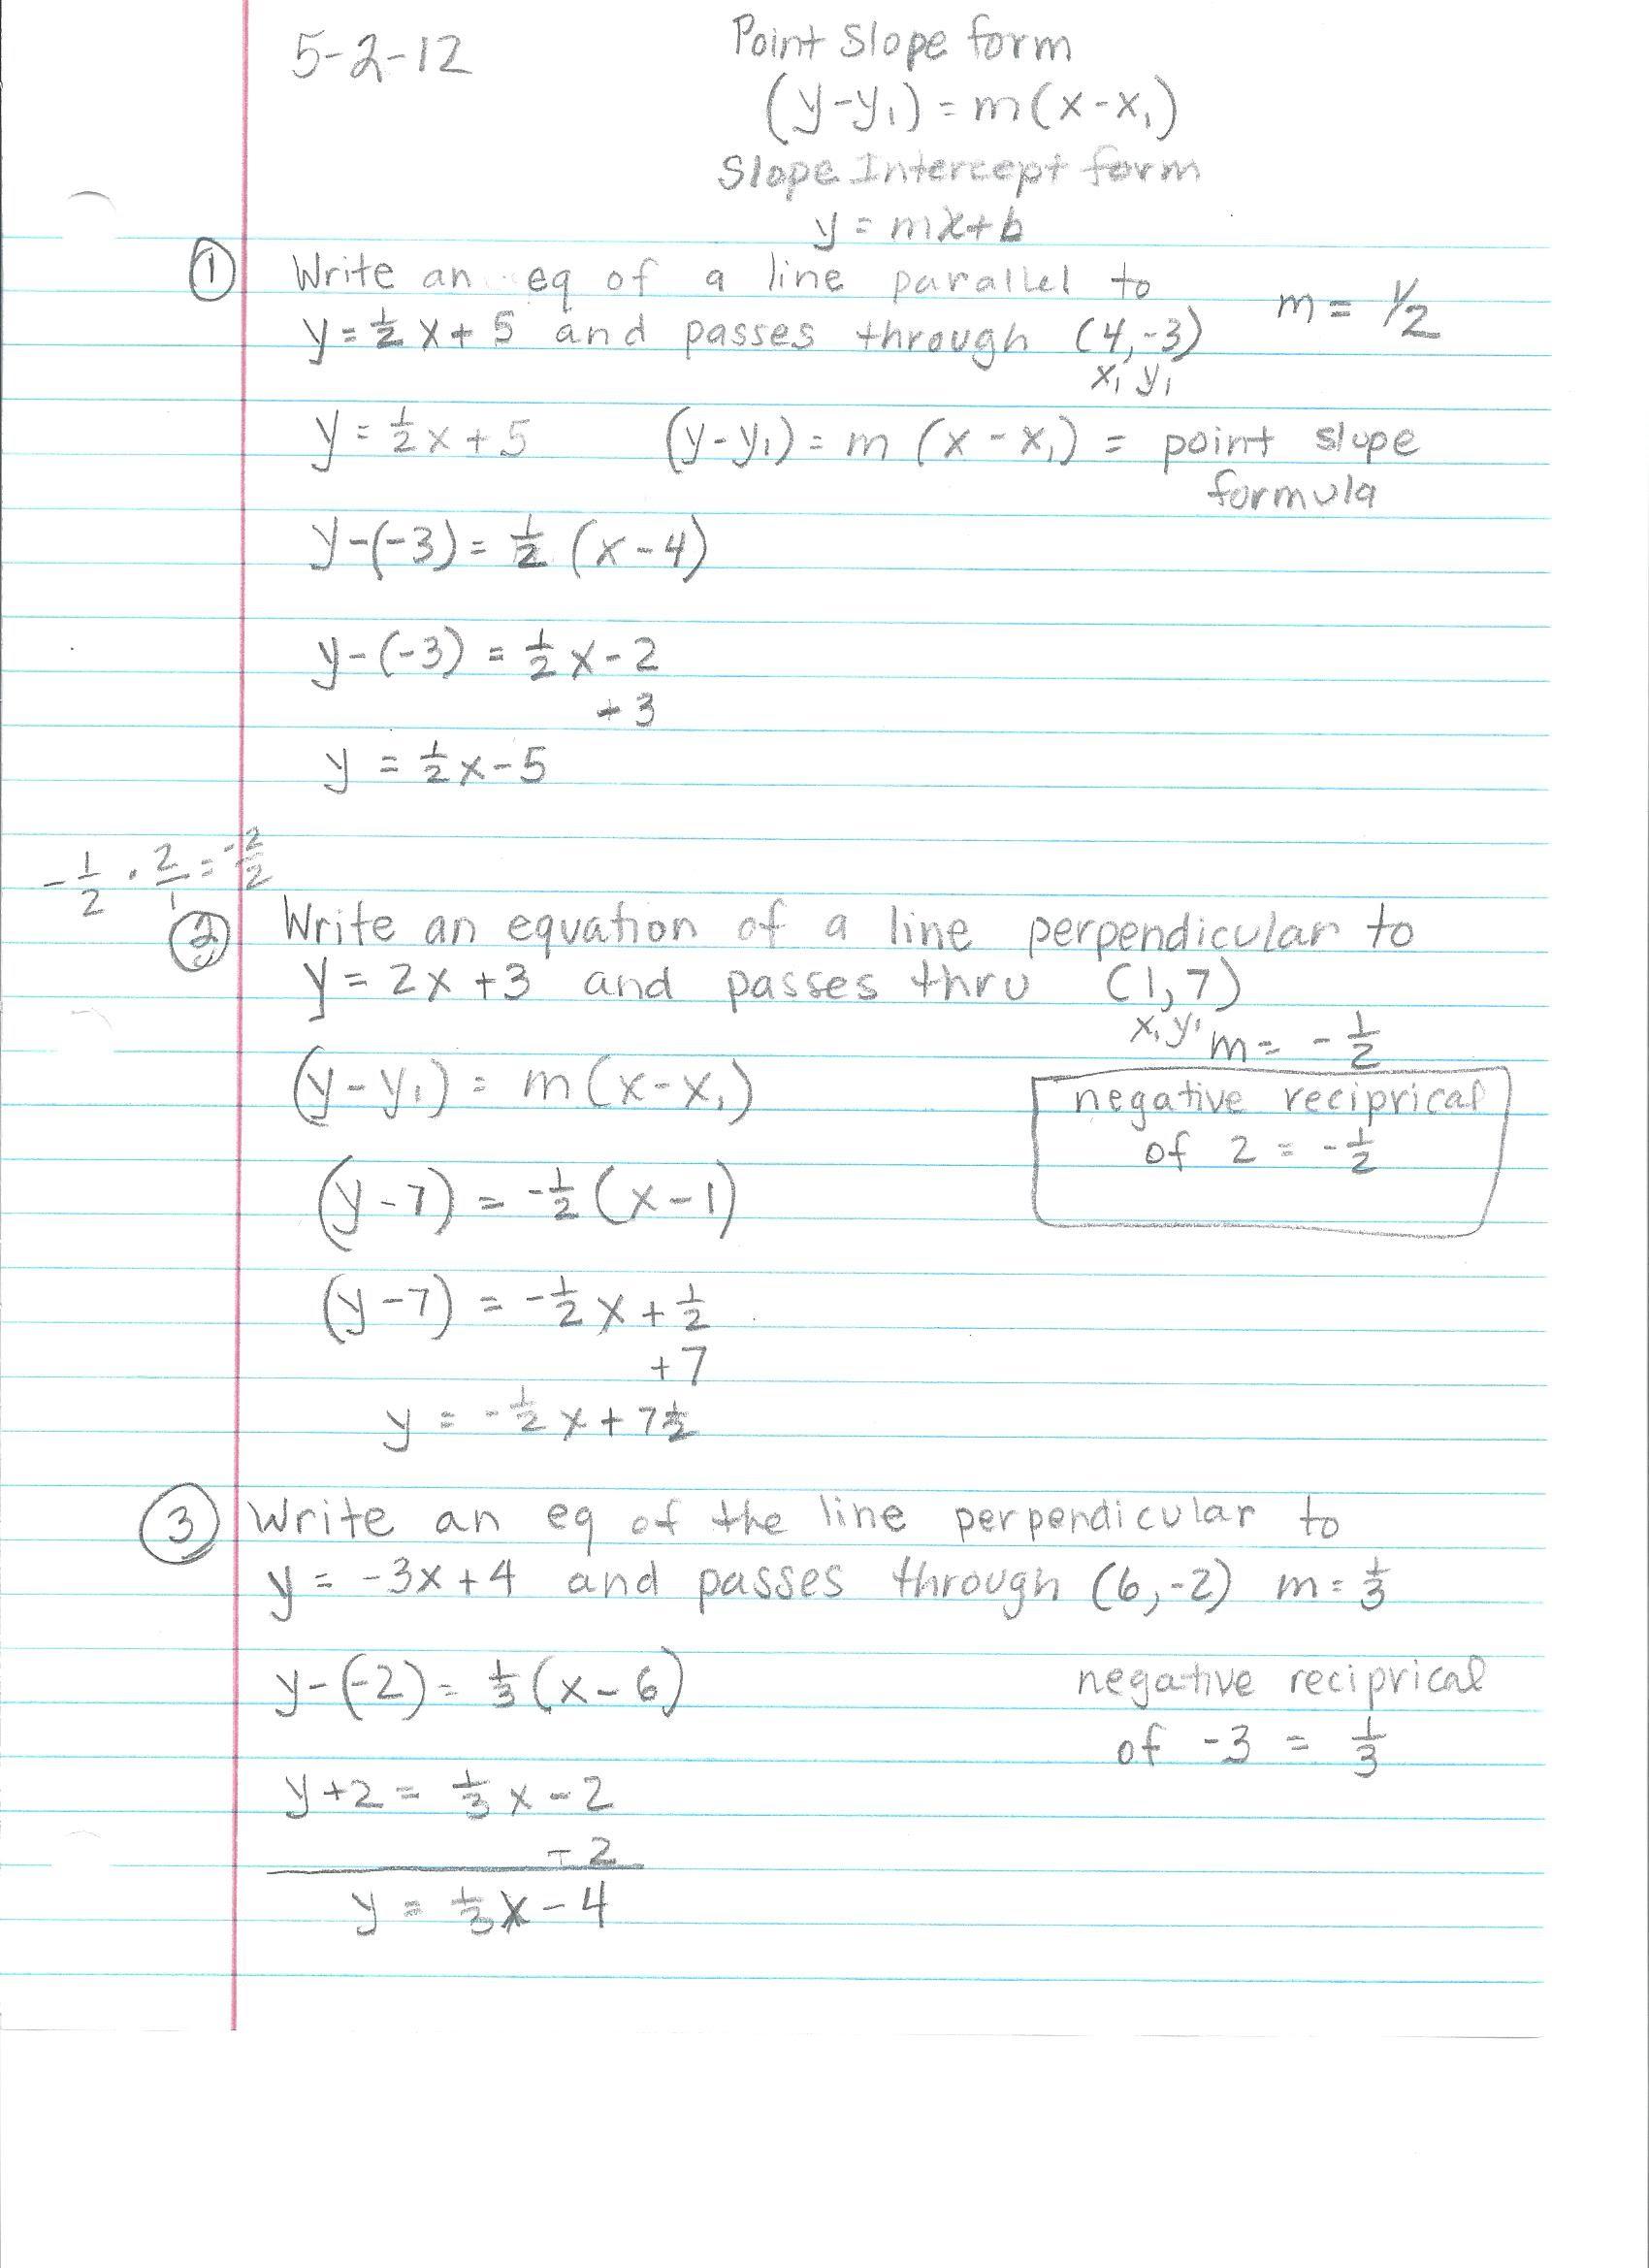 Algebra 1 Notes For 9th Grade